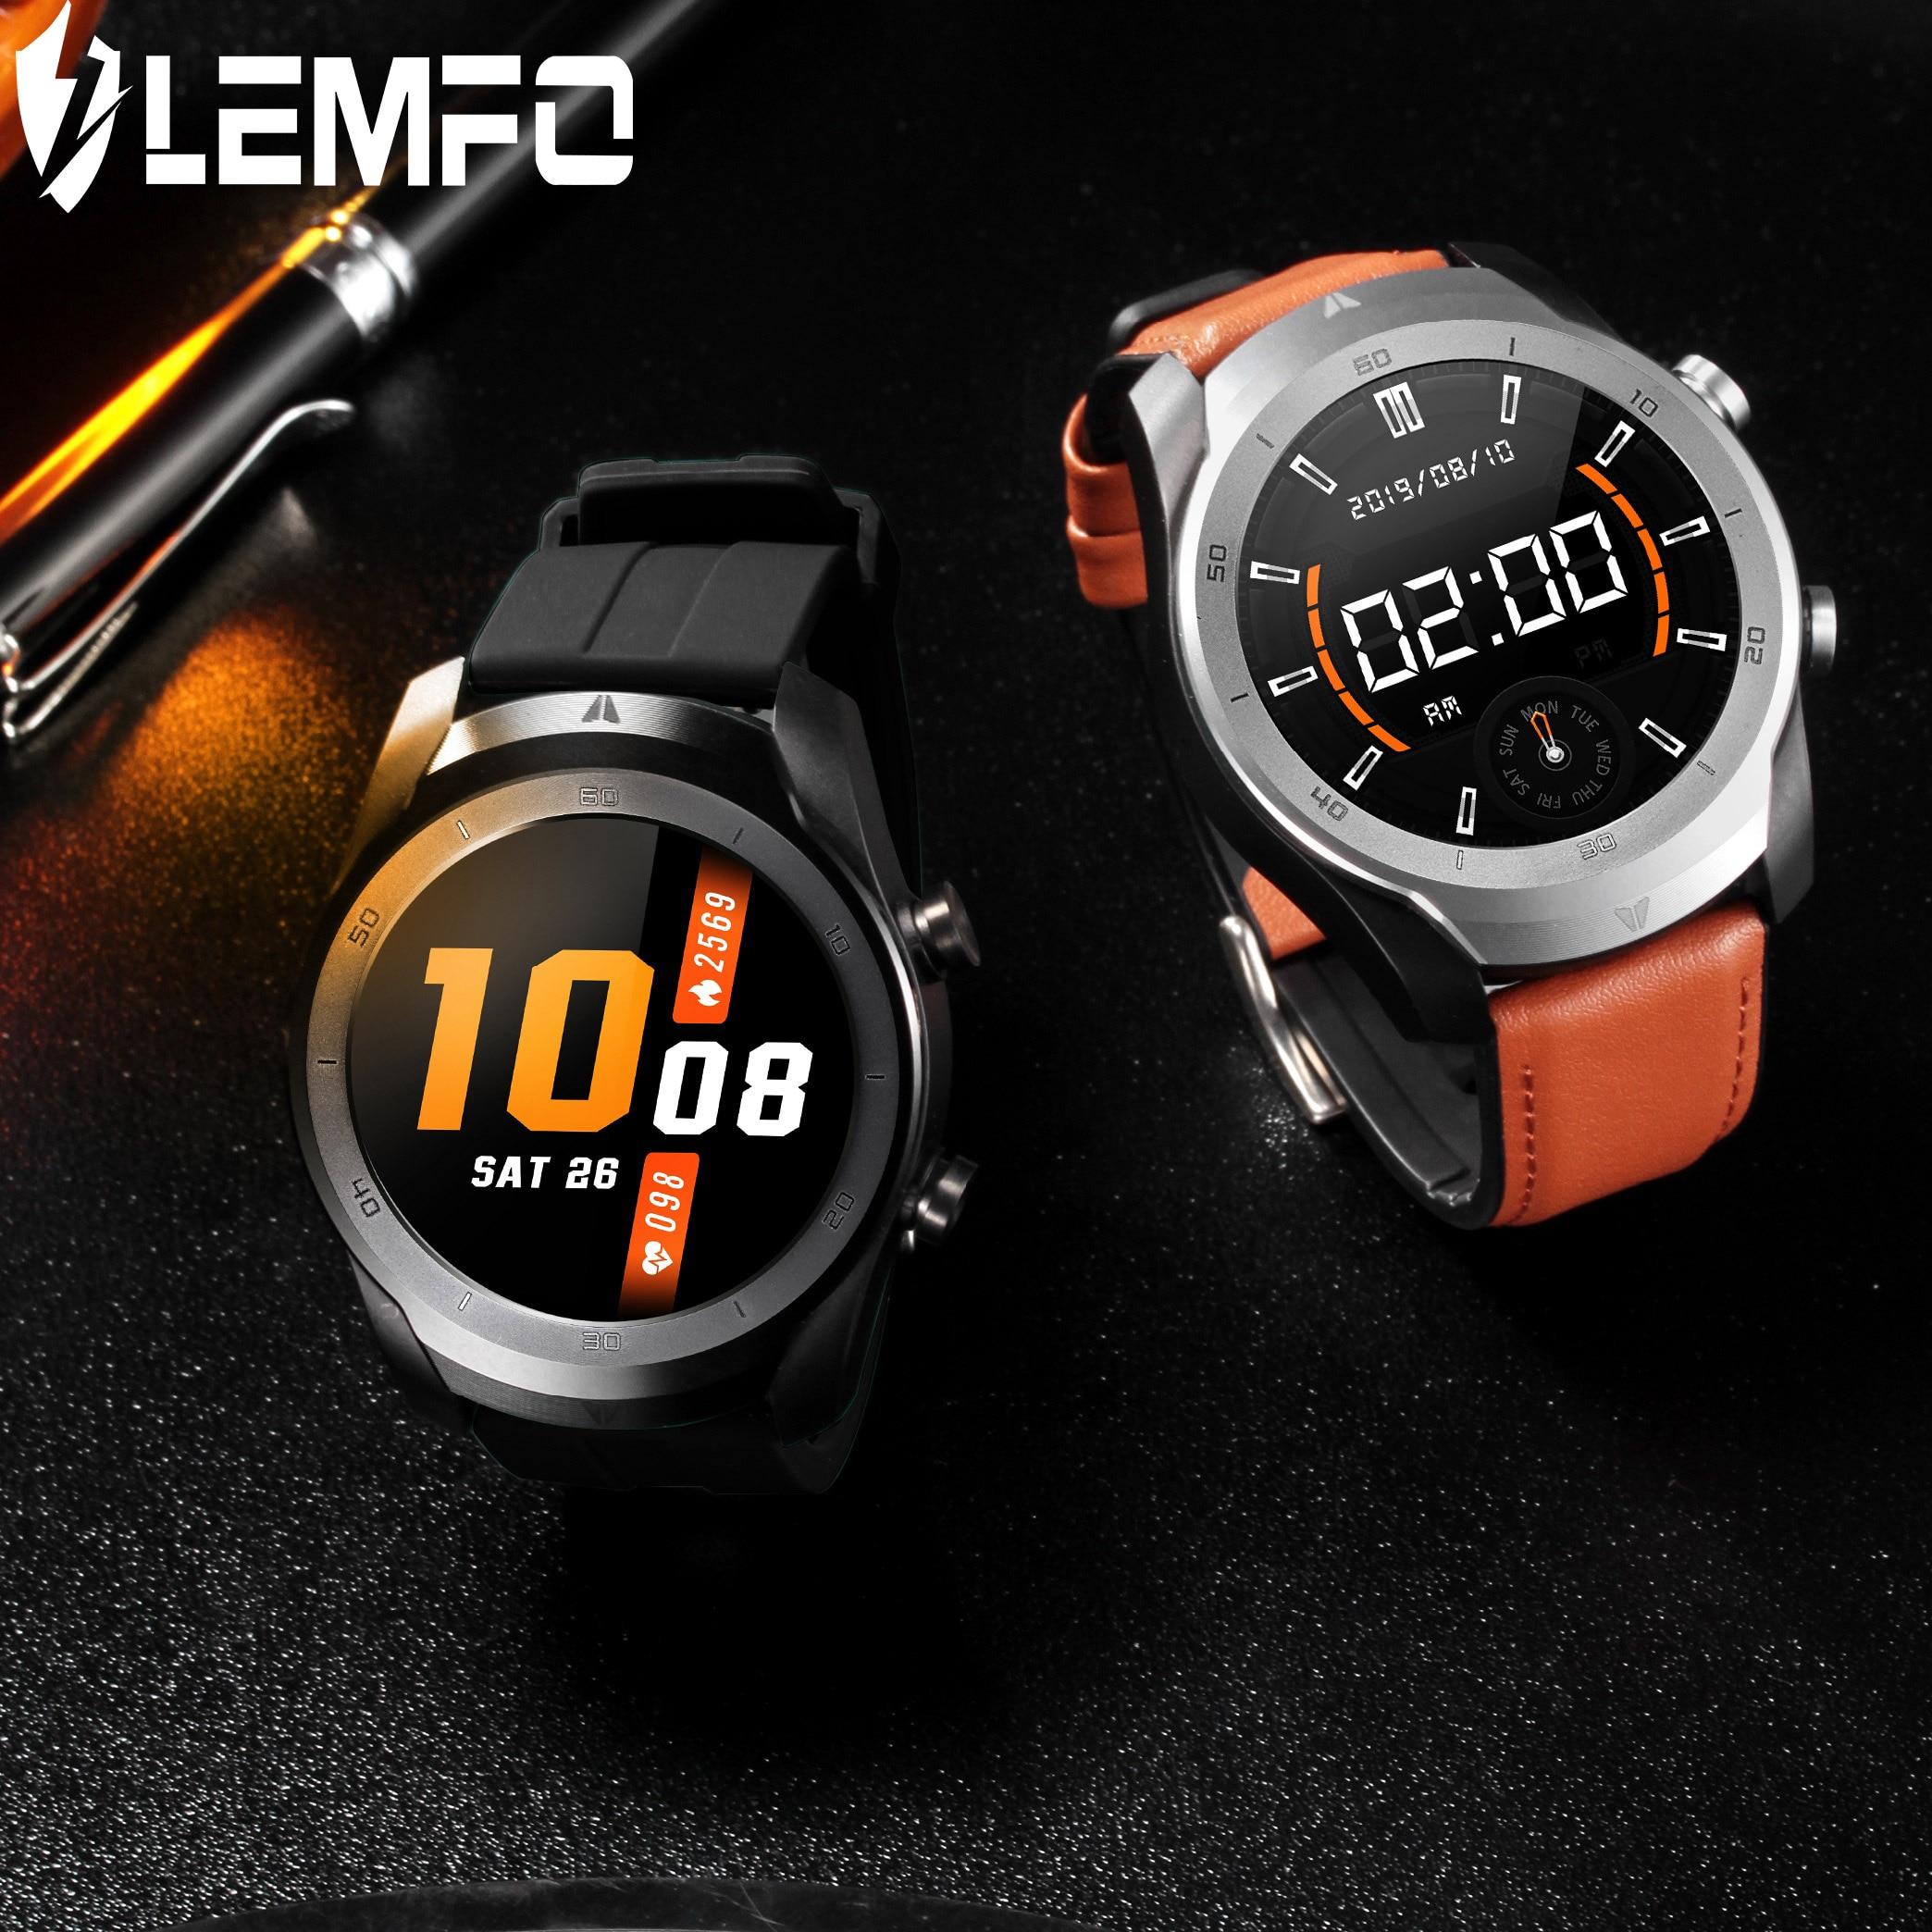 LEMFO DT79 2020 New Smart Watch Men Bluetooth Call 360*360 HD ECG+PPG Smart Watch Android IOS Bluetooth Music 560mAh Big Battery(China)